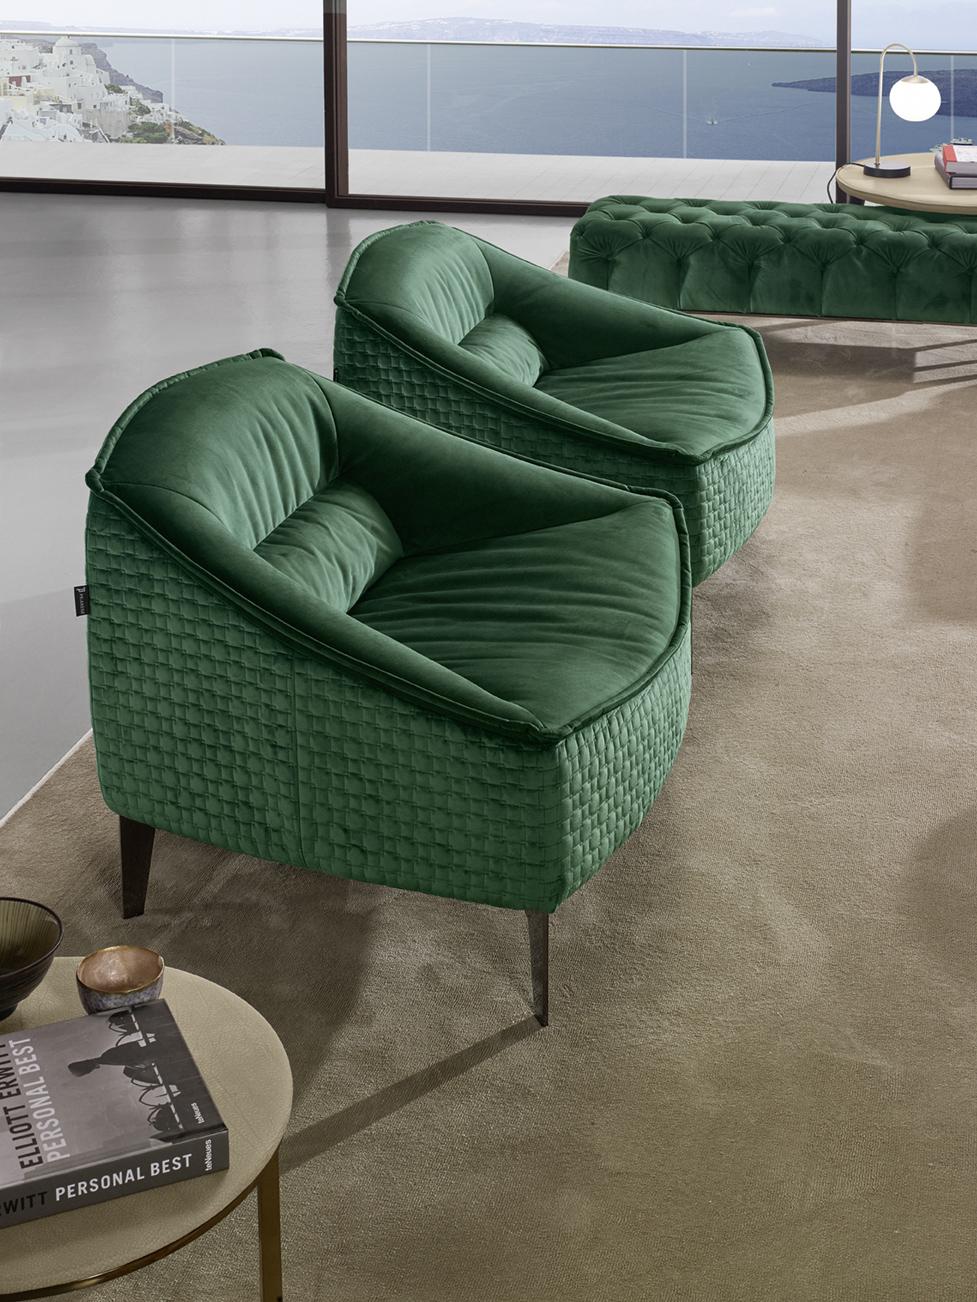 platies prasines veloudes polithrones, wide petrol armchairs with wooden legs, veloudines prasines polithrones luxury,